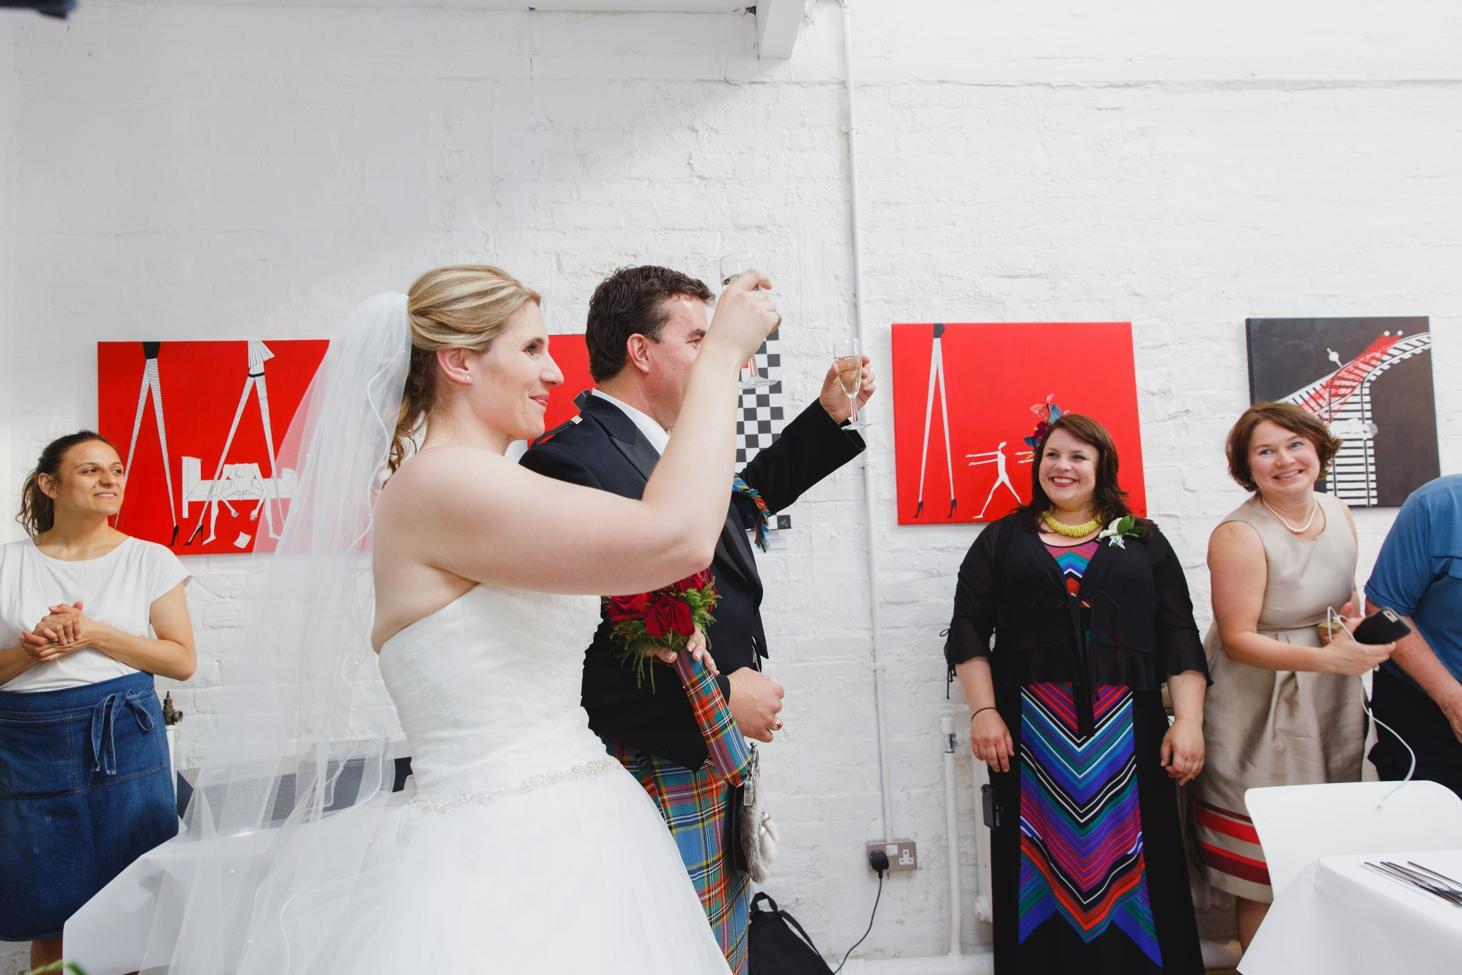 Oxford wedding photography Sarah Ann Wright_0112